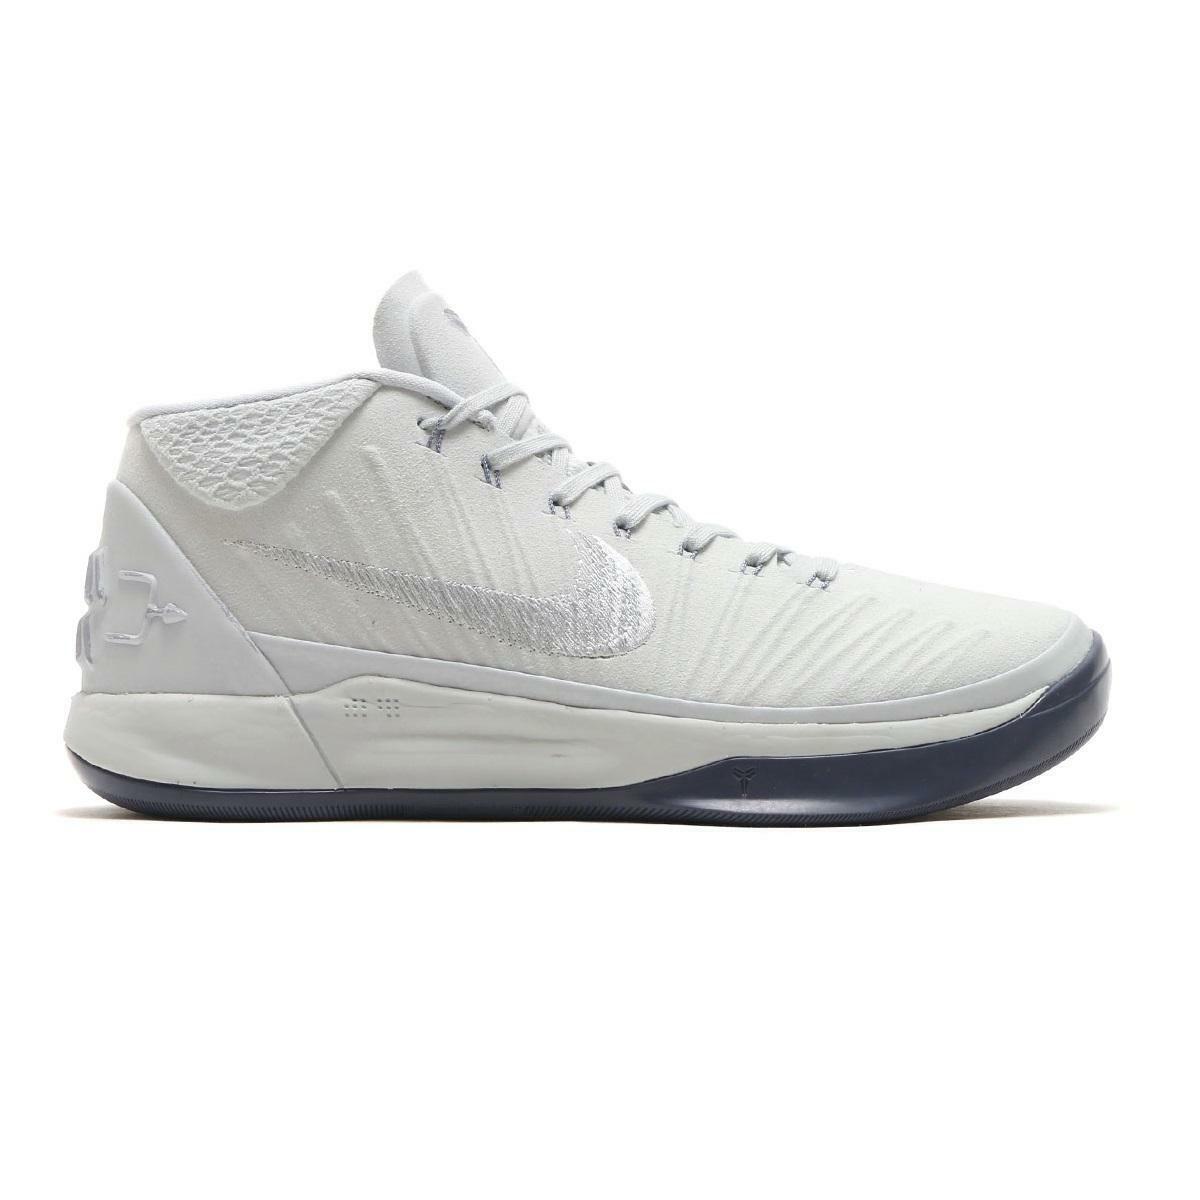 Homme NIKE KOBE AD Pure Platinum Basketball paniers 922482 004